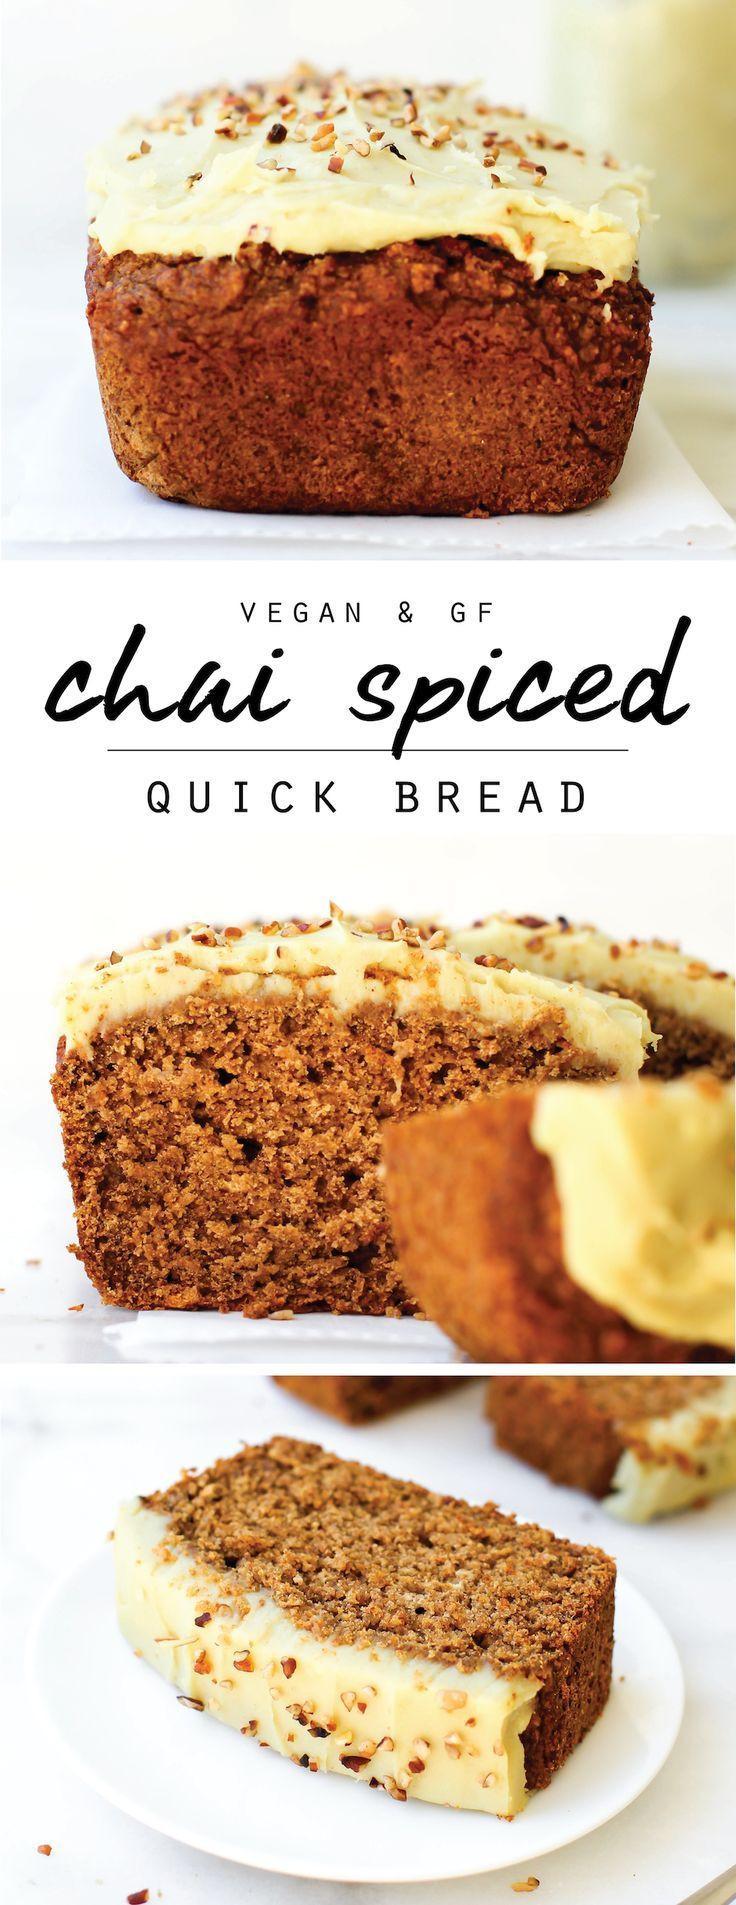 Quick Vegan Desserts  Best 25 Fruit bread ideas on Pinterest